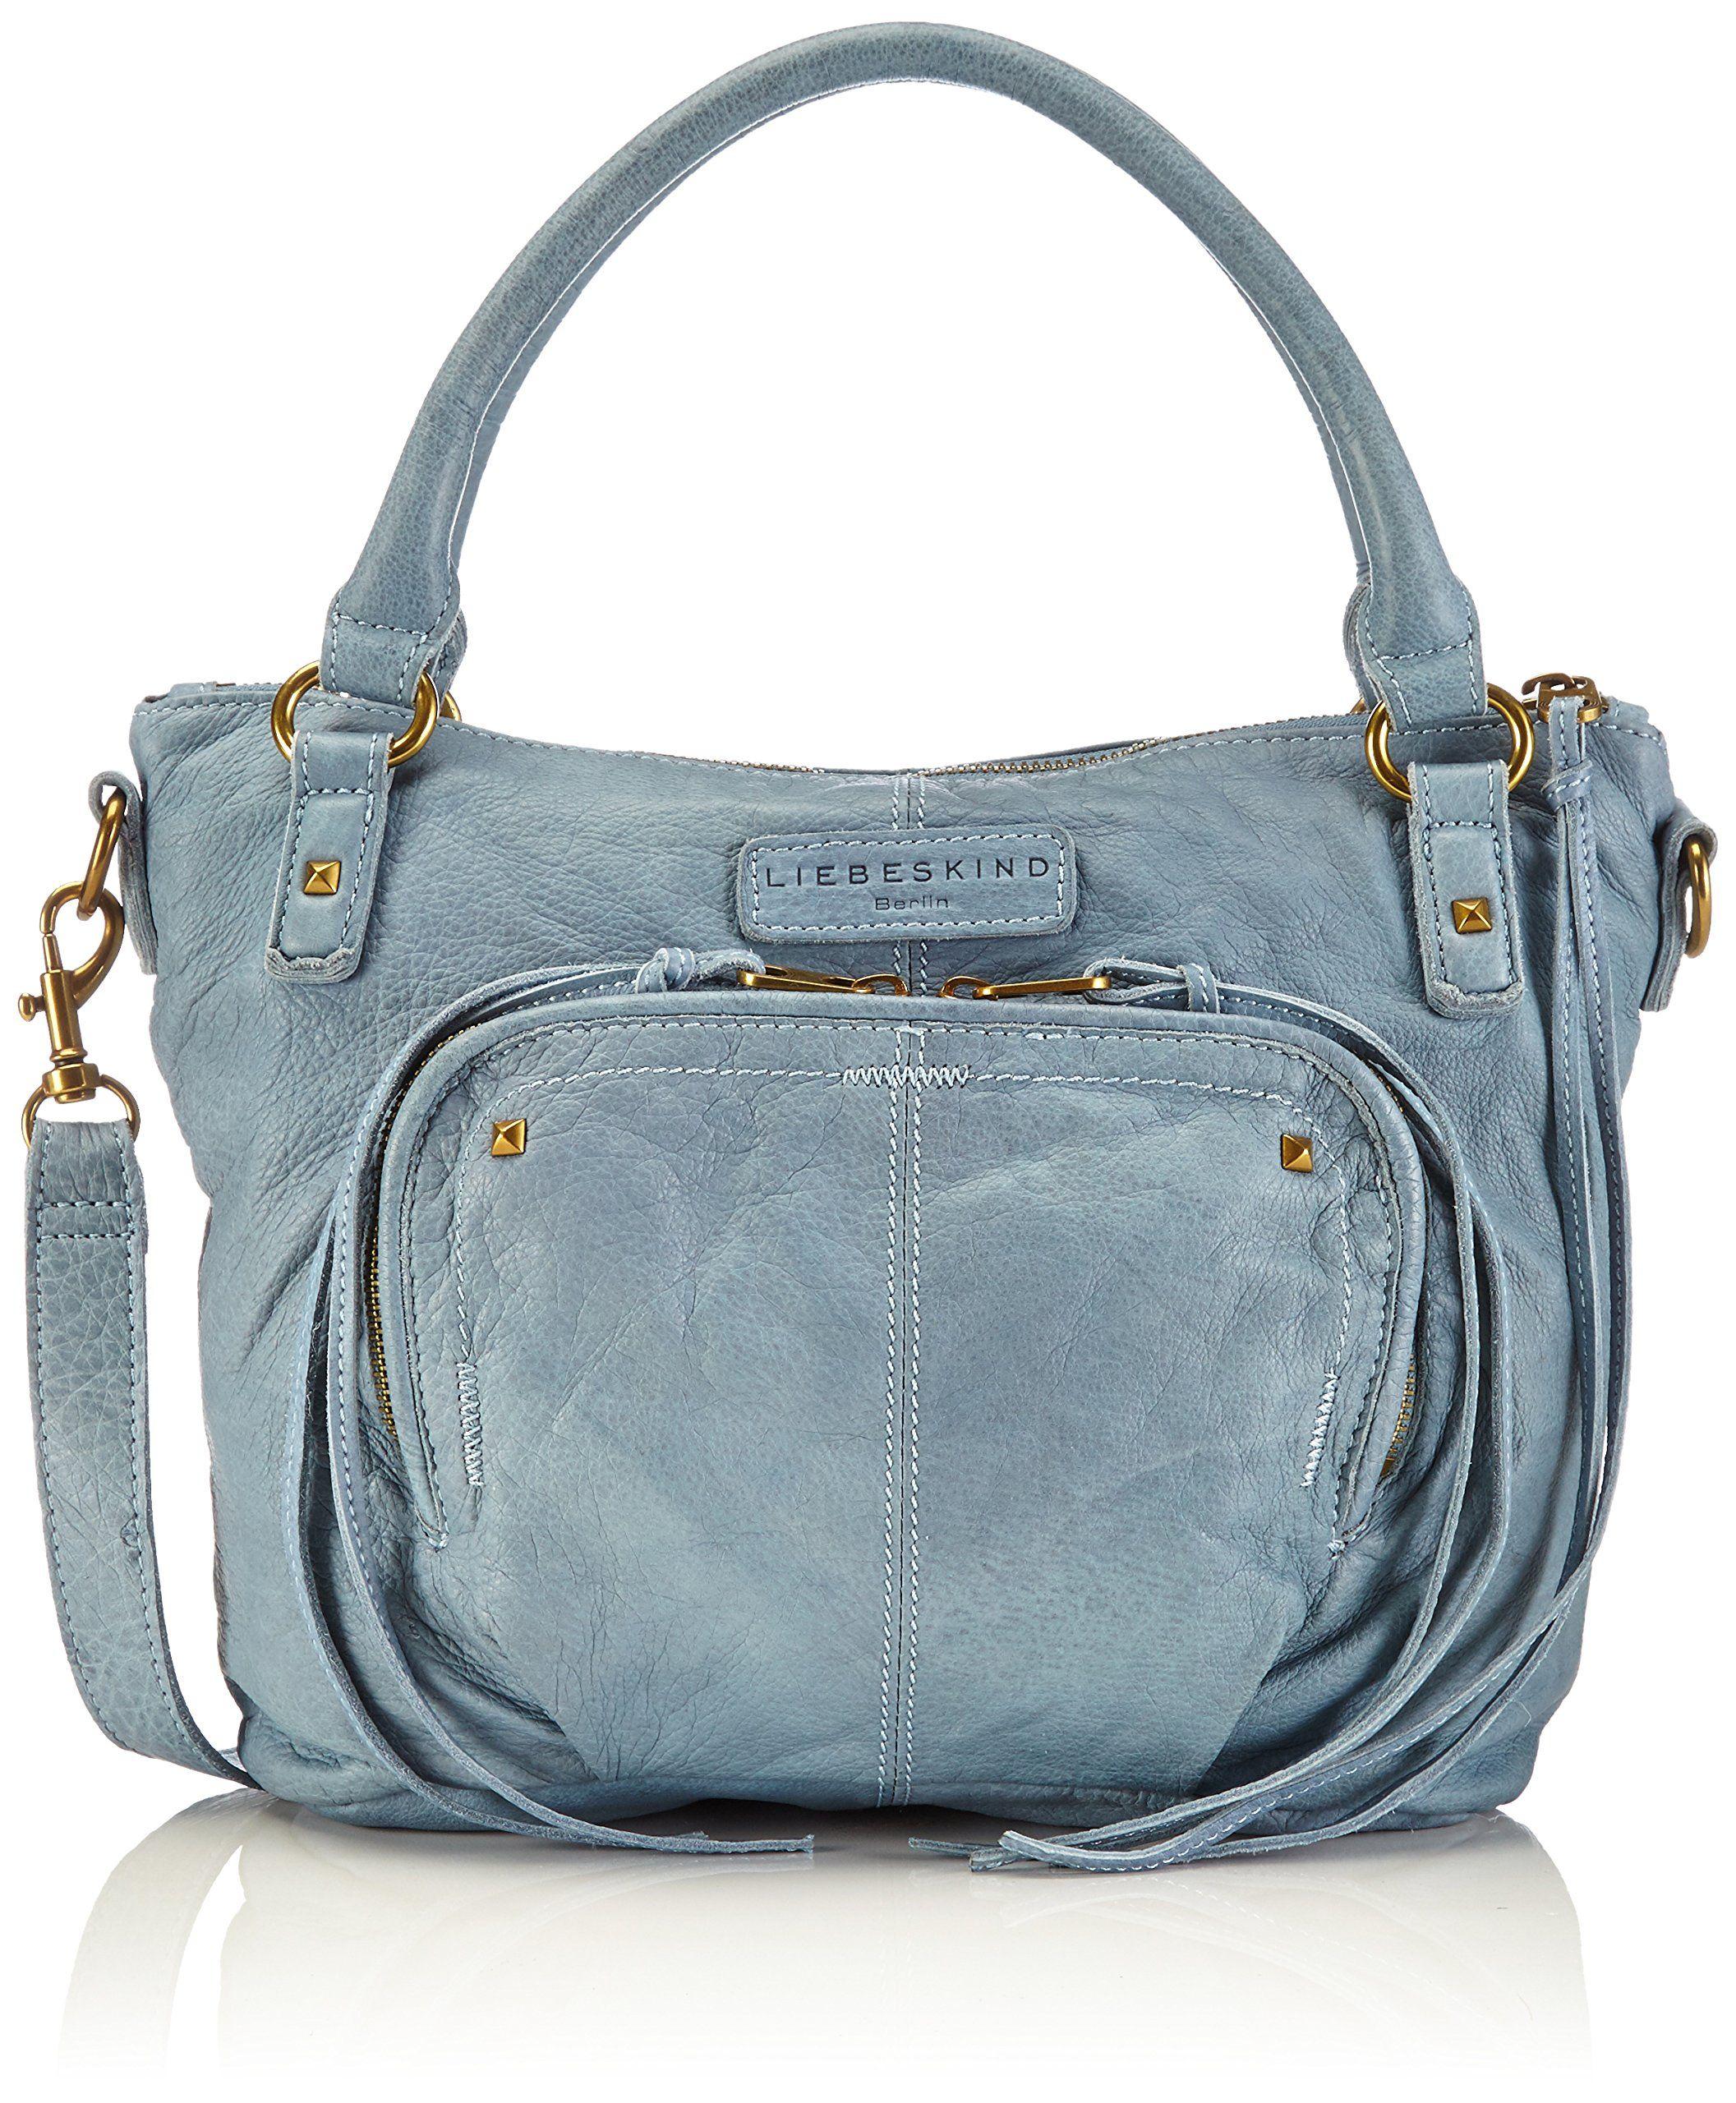 689094e15ac Amazon.com  Liebeskind Berlin Gina F Shoulder Bag, Black, One Size  Shoes